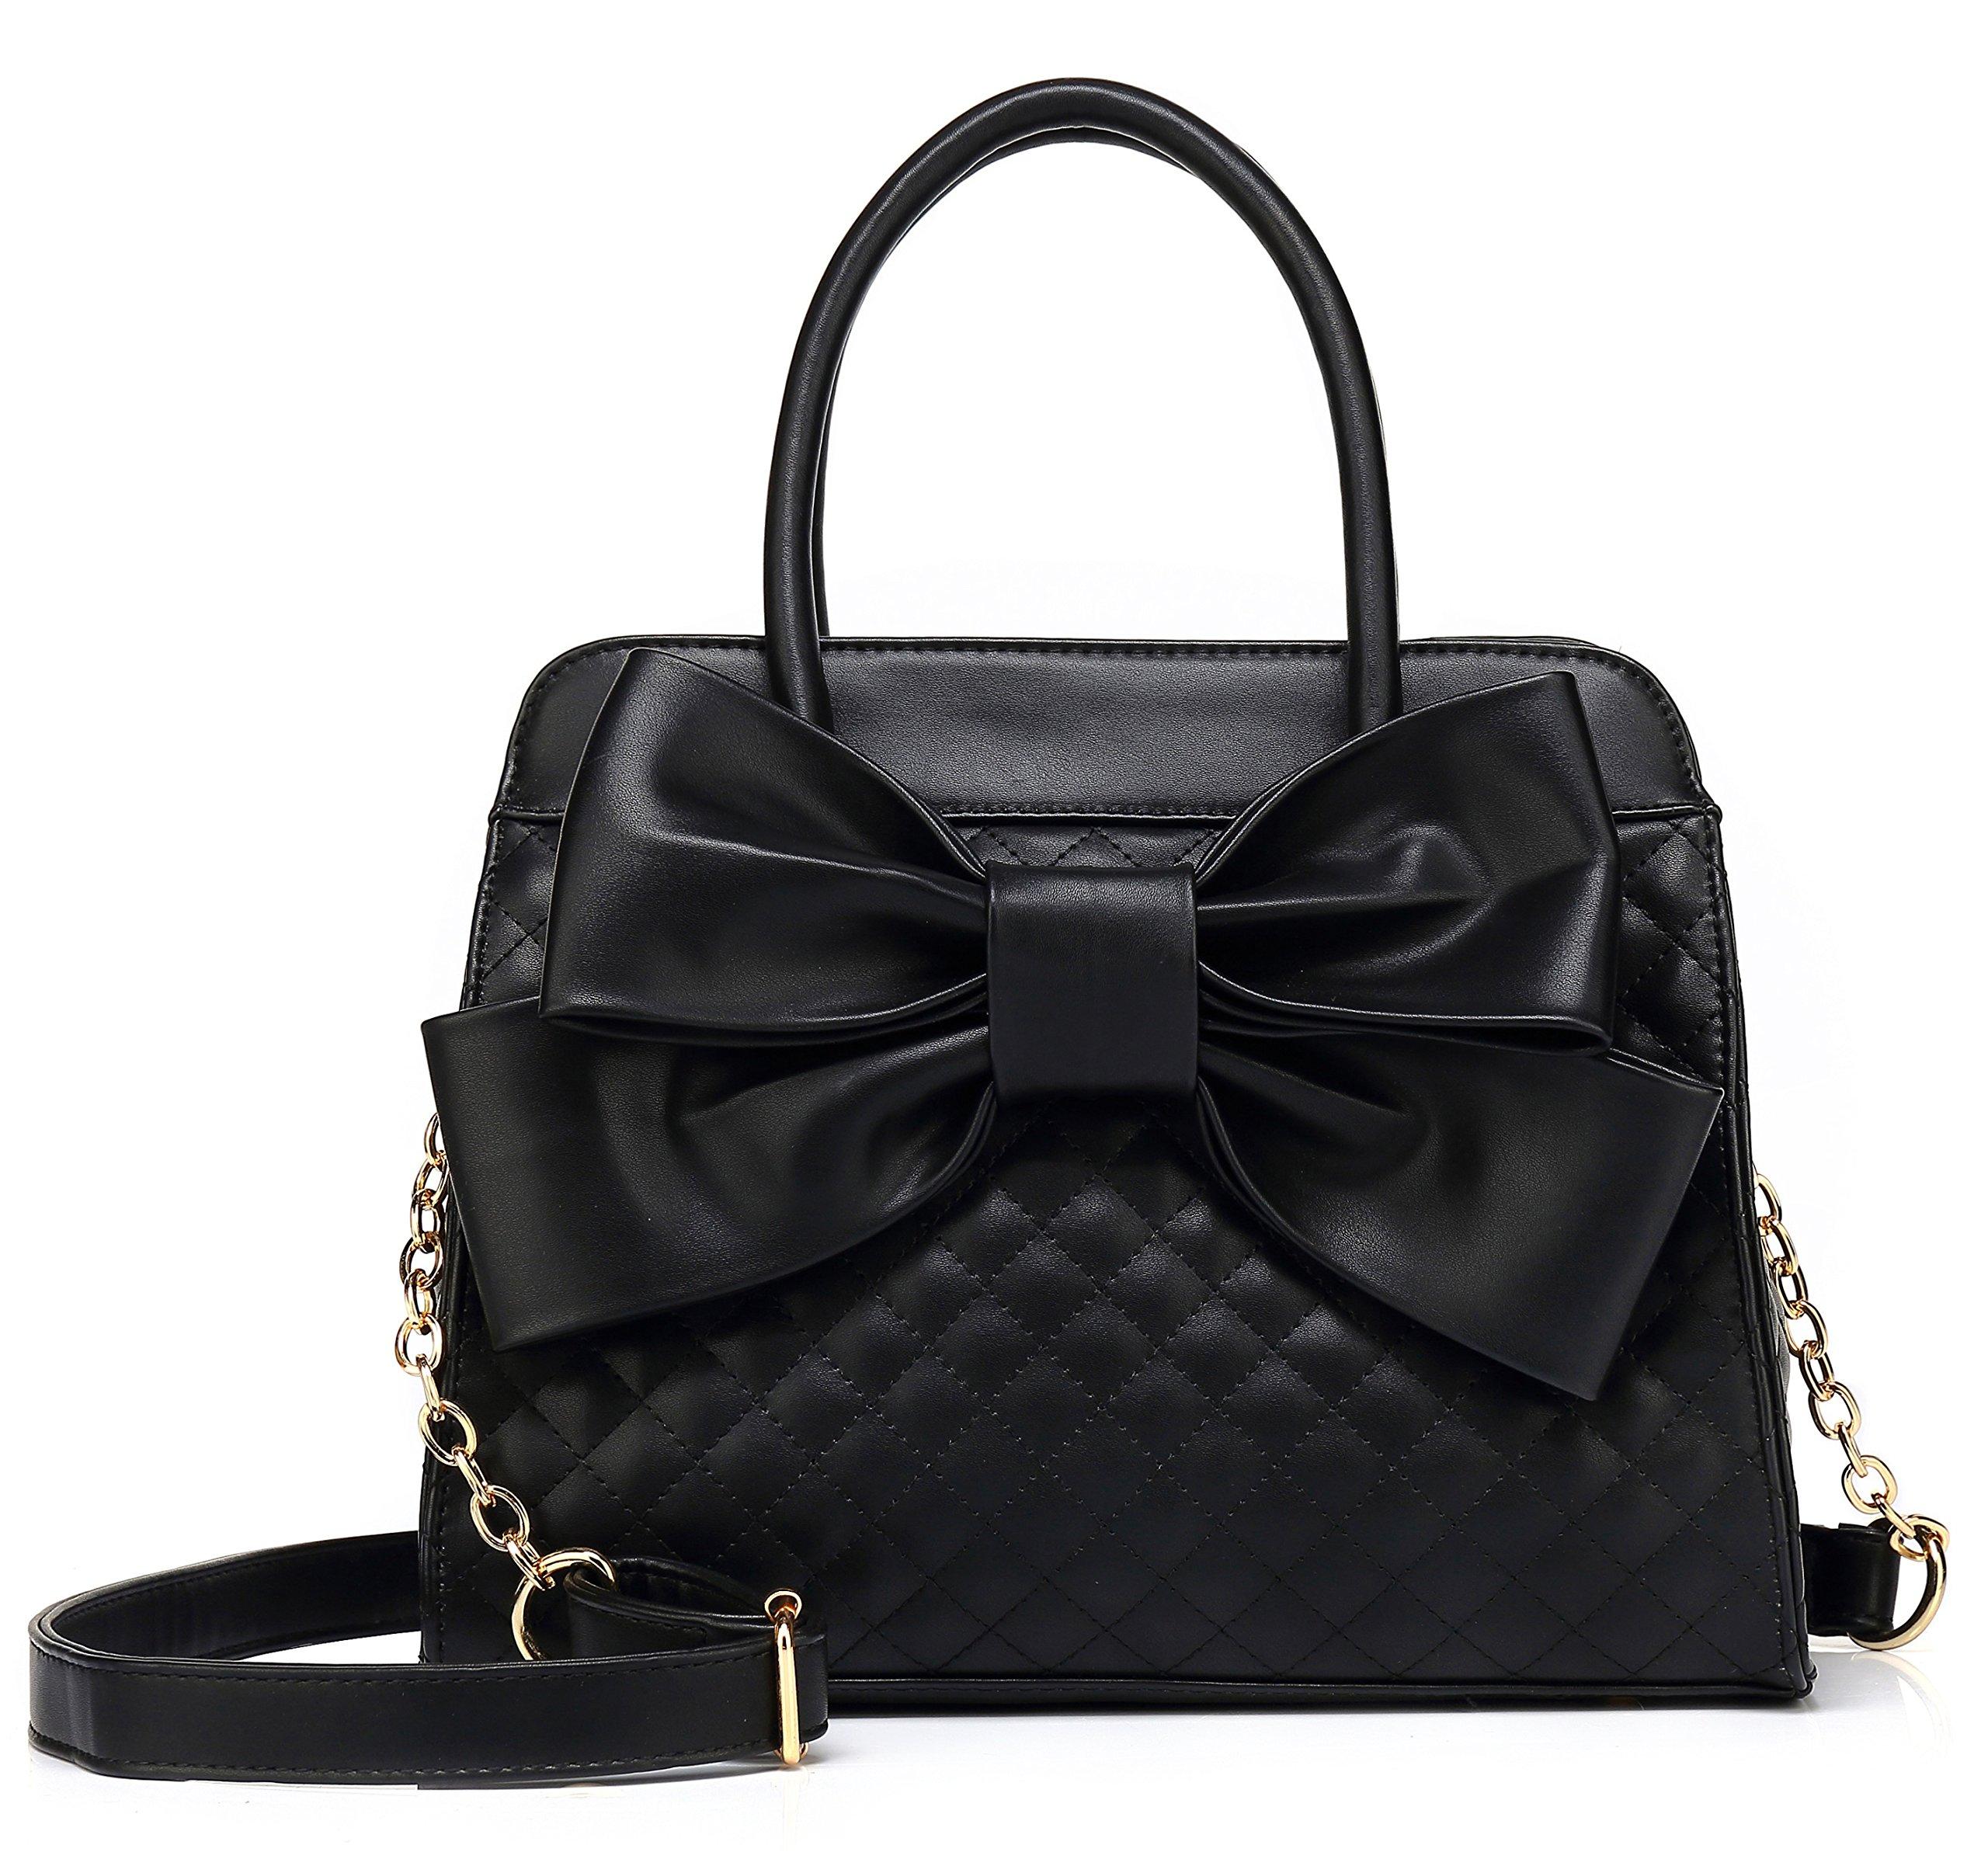 Scarleton Ultra Soft Tote Handbags Shoulder Bags Hobo Bags Satchel Purses Top Handle Bag Crossbody Bags for Women H104801N - Black